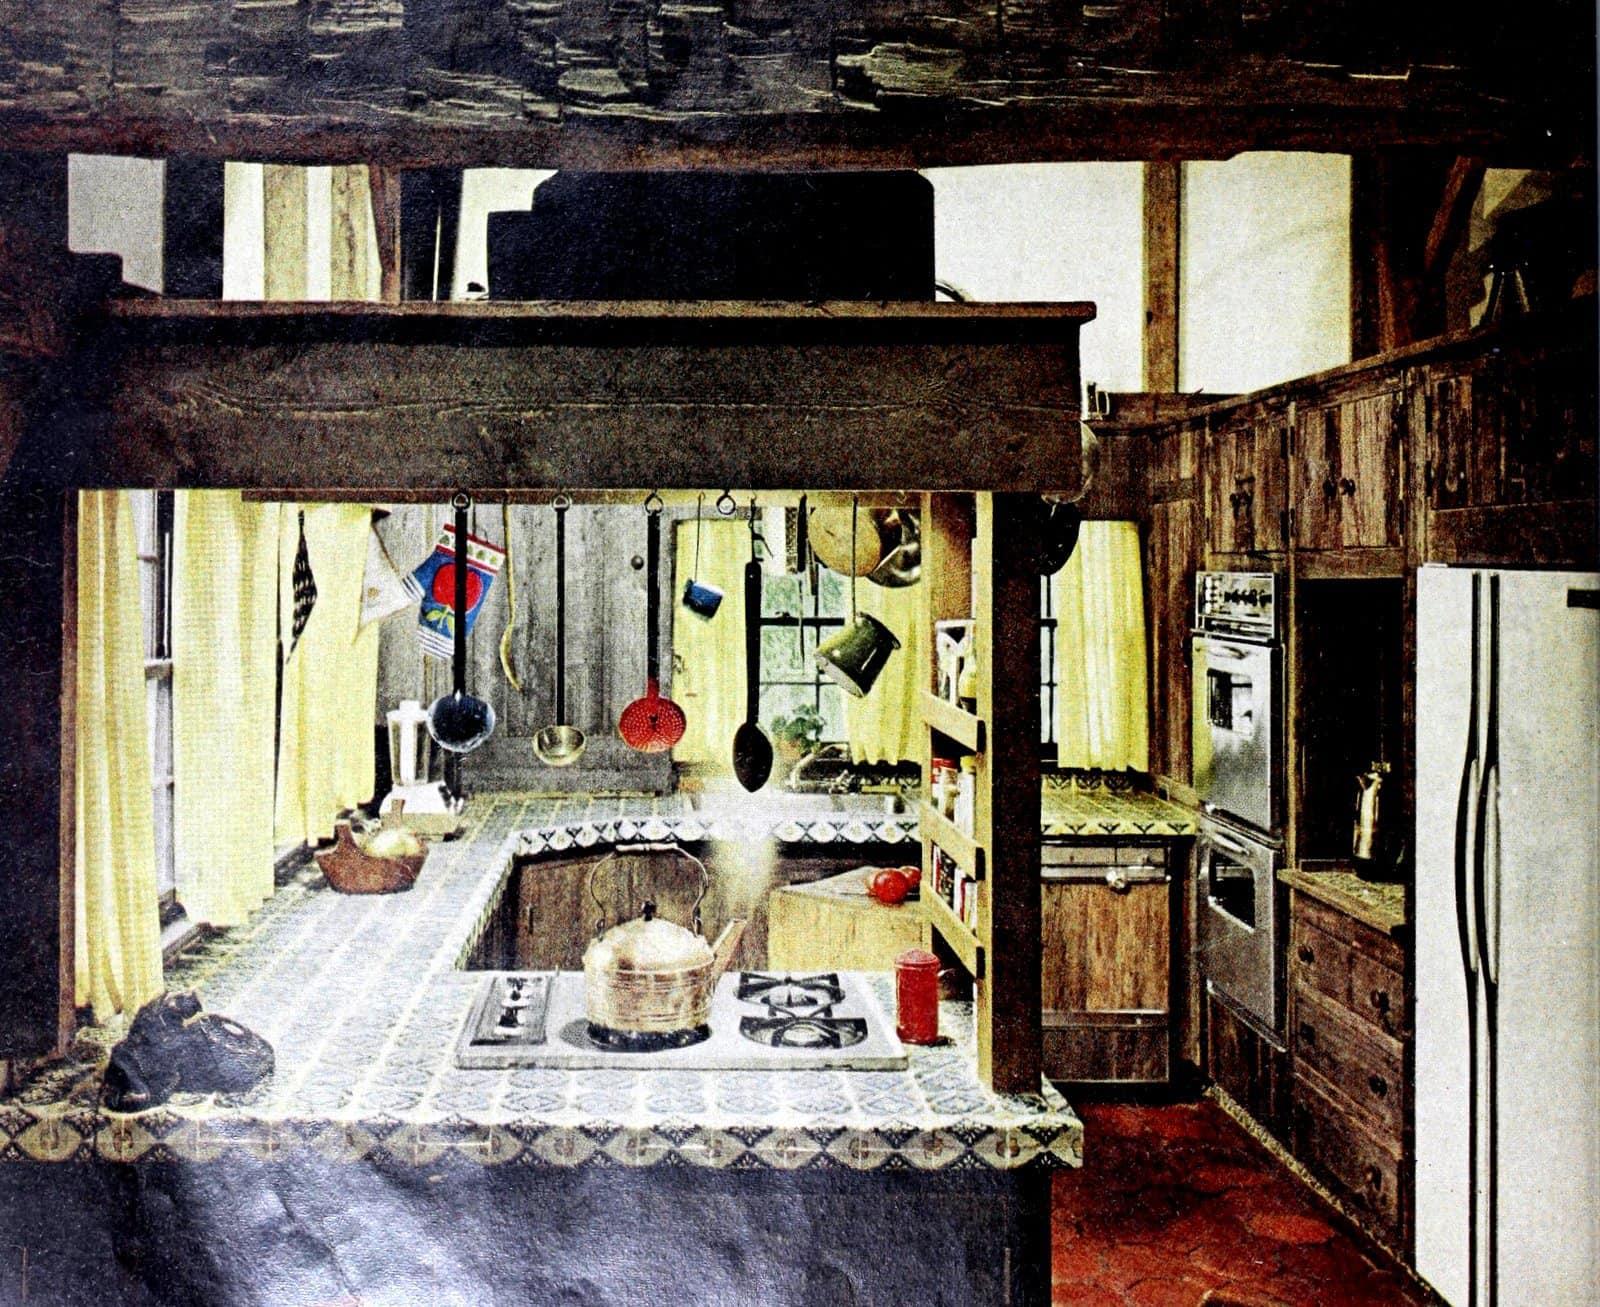 Vintage 1969 kitchen tile design ideas